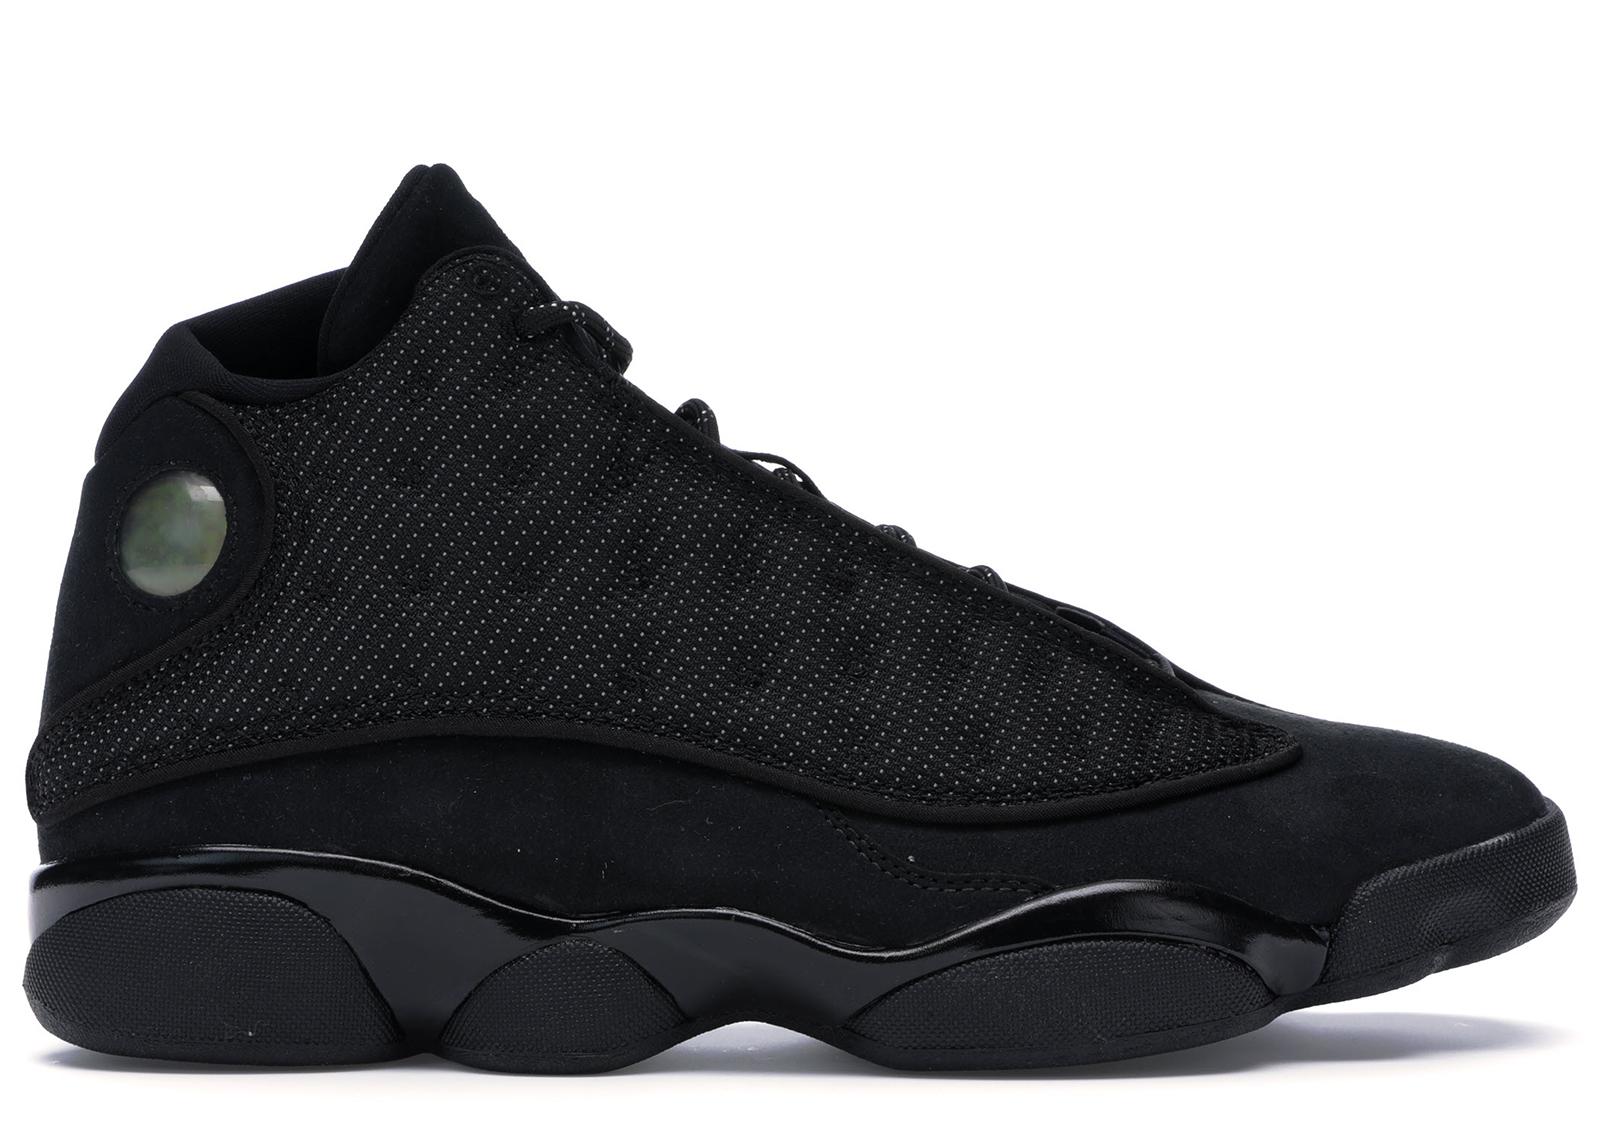 Acheter Air Jordan 13 Chaussures et sneakers neuves